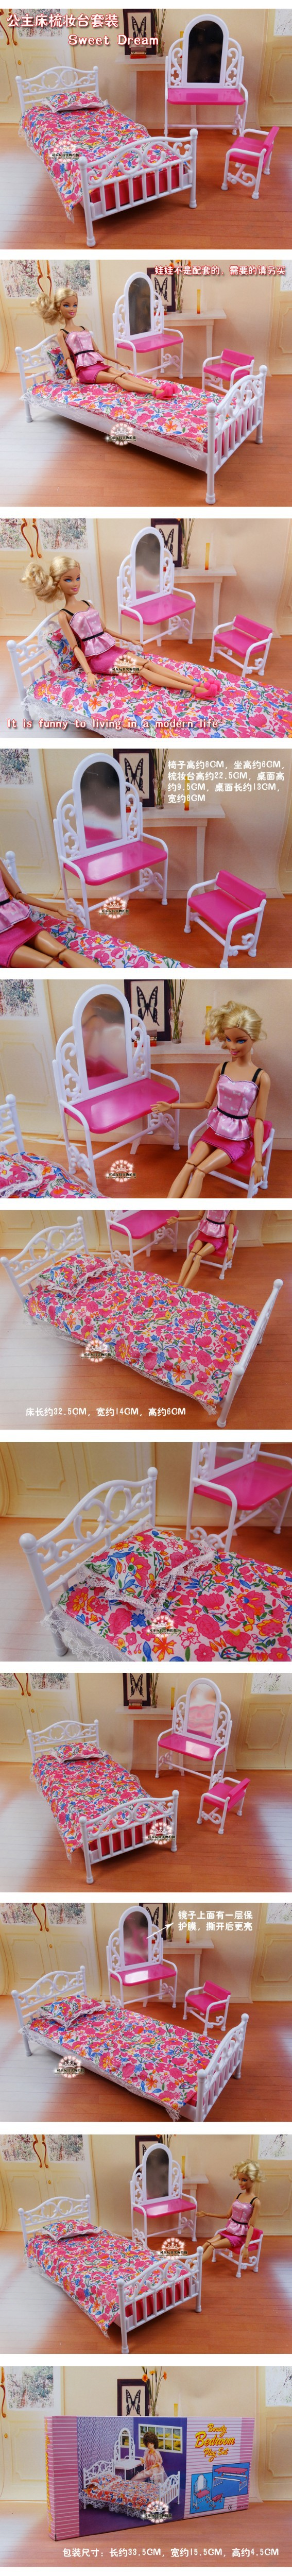 Free Transport,Dream Mattress Set dresser for barbie doll,doll furnishings doll equipment for barbie,kids diy toys